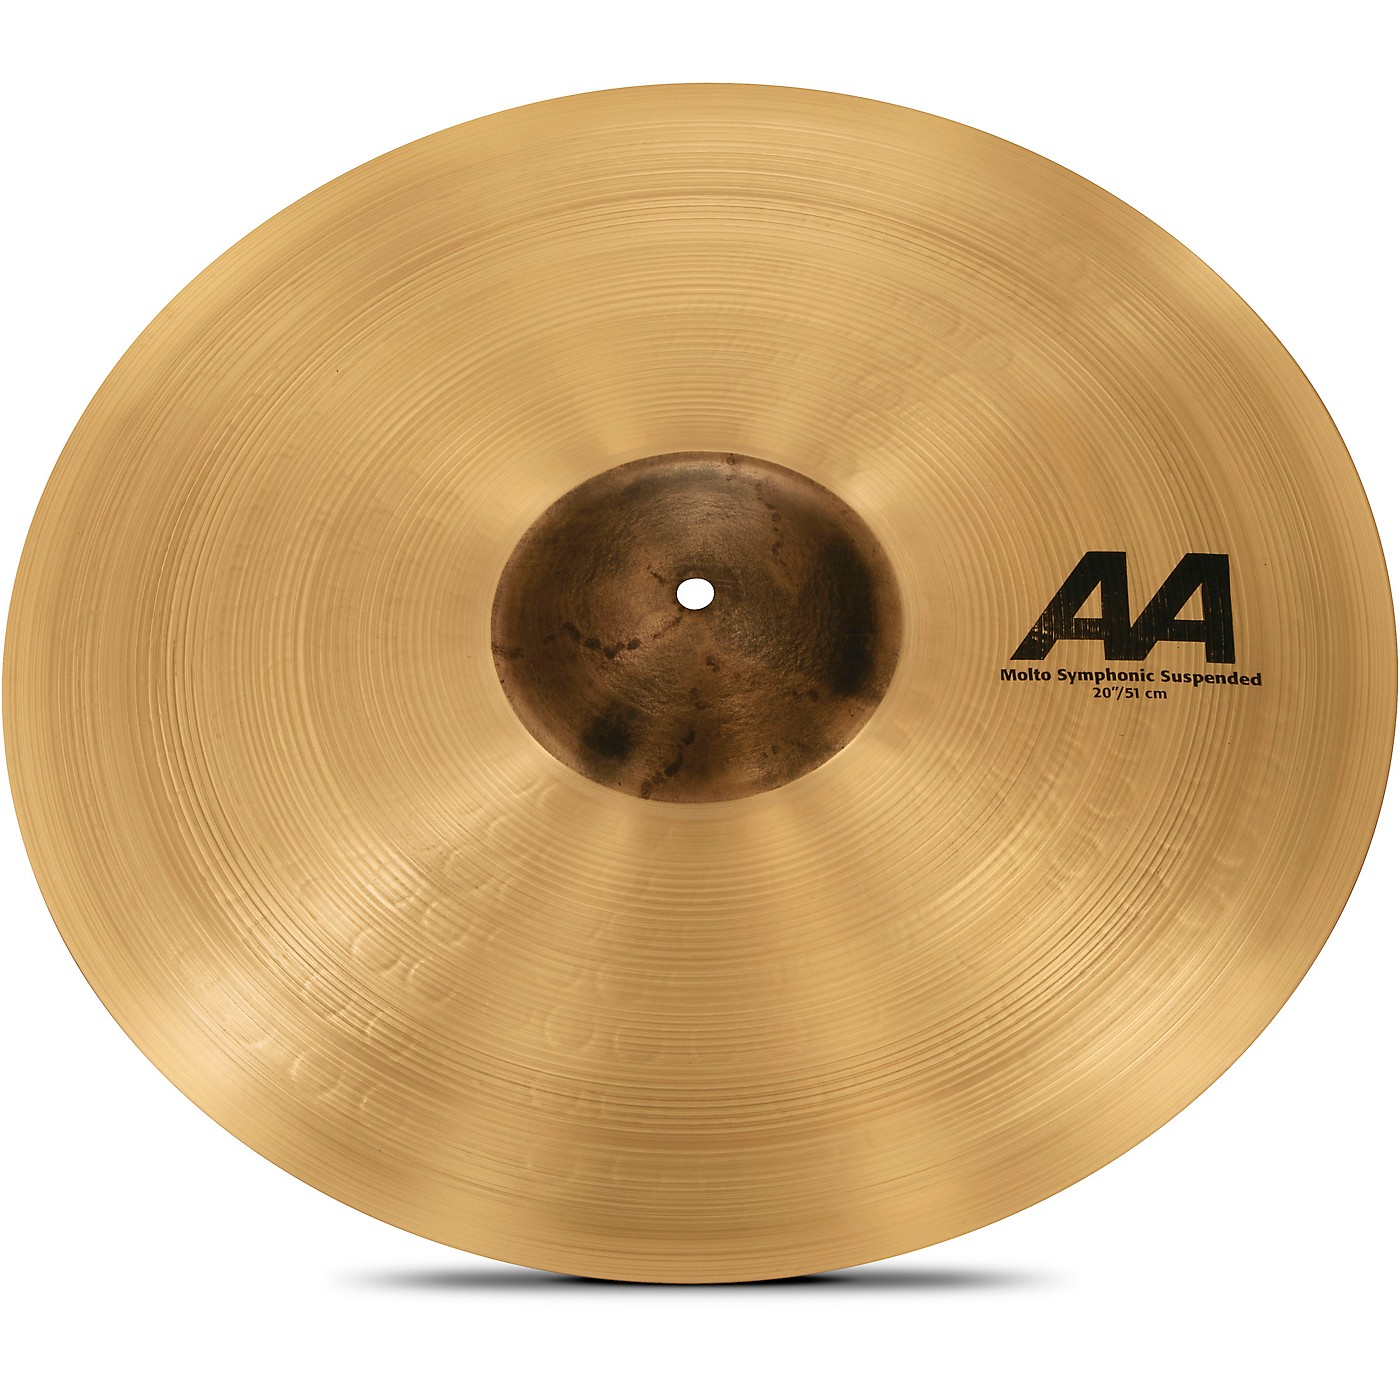 Sabian AA Molto Symphonic Series Suspended Cymbal thumbnail